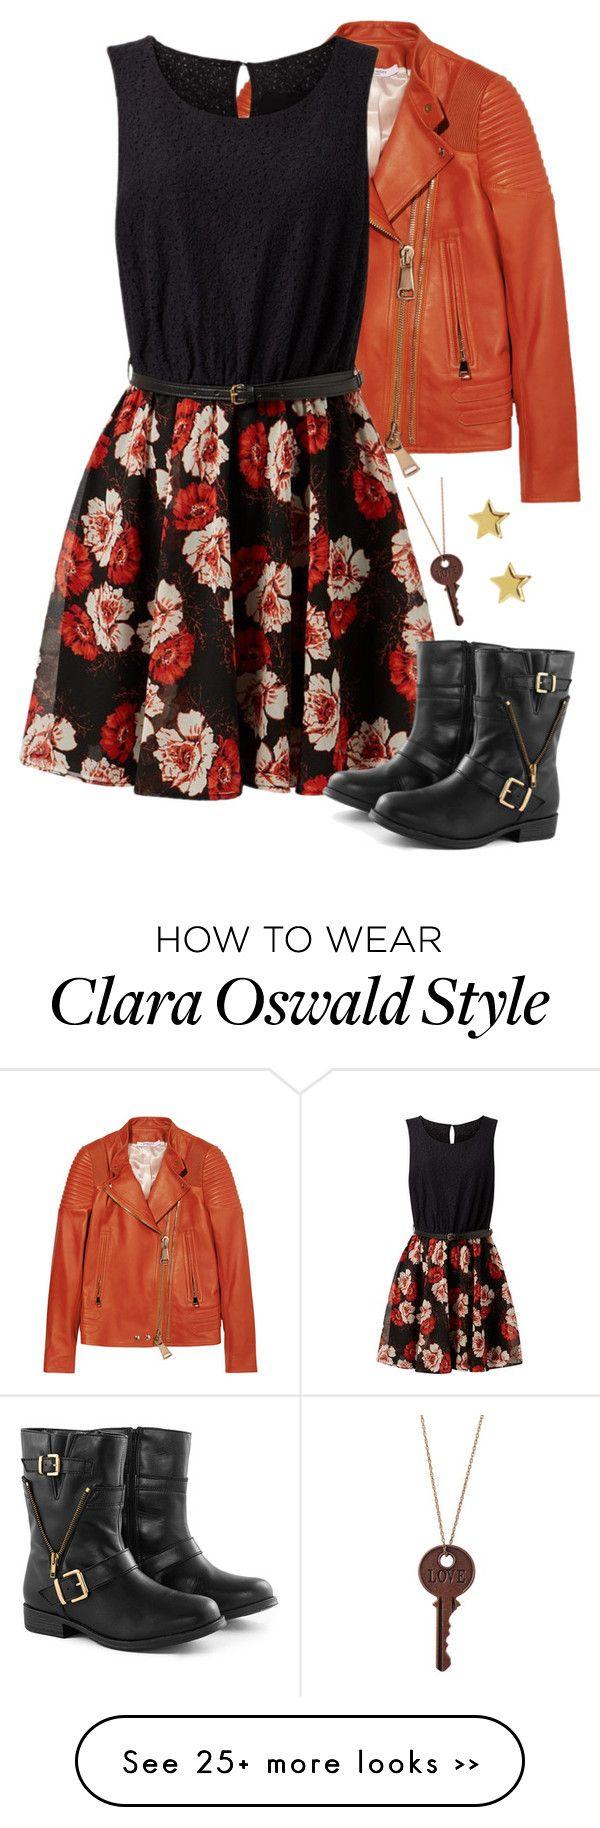 """Clara Oswald"" by cosplaycrazy13 on Polyvore"